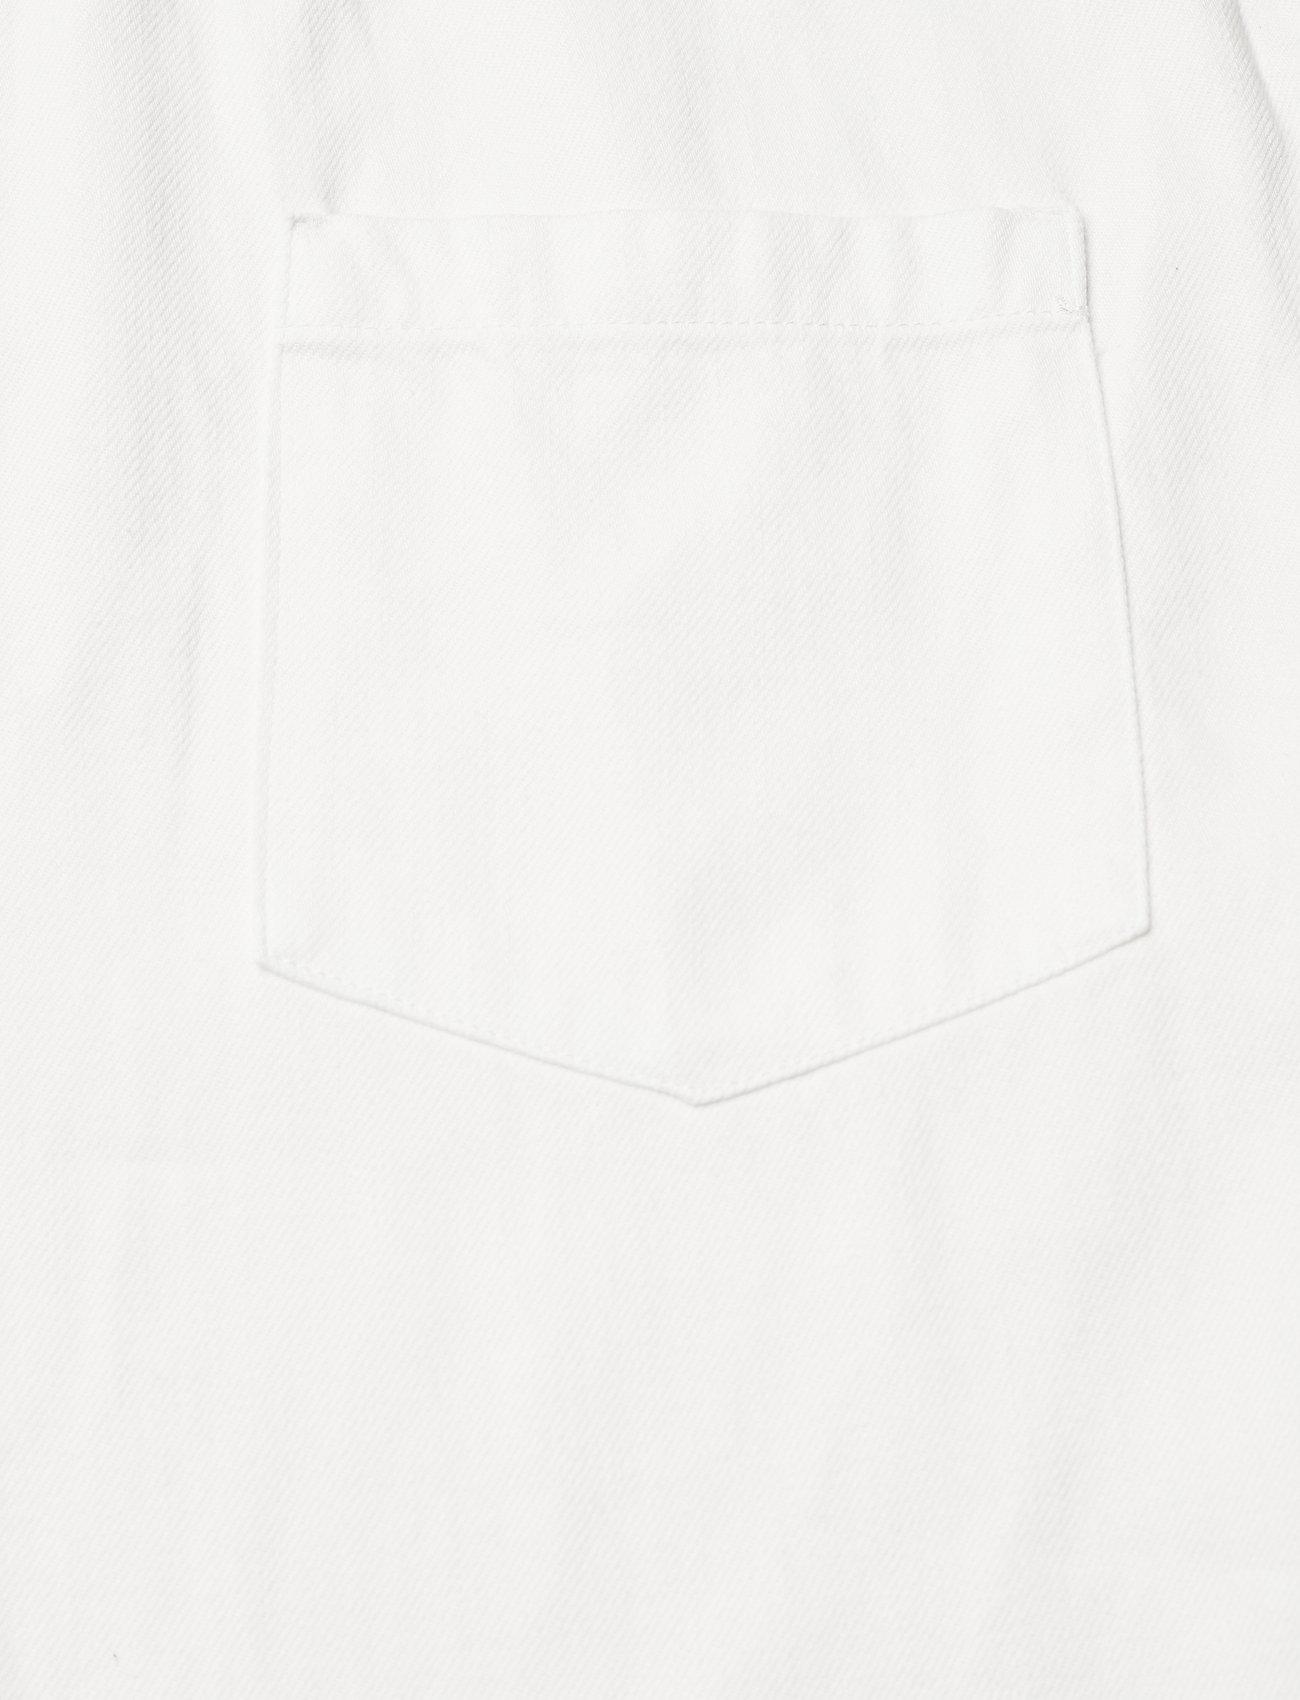 Superdry - SLEEVELESS JUMPSUIT - kläder - natural wash - 3